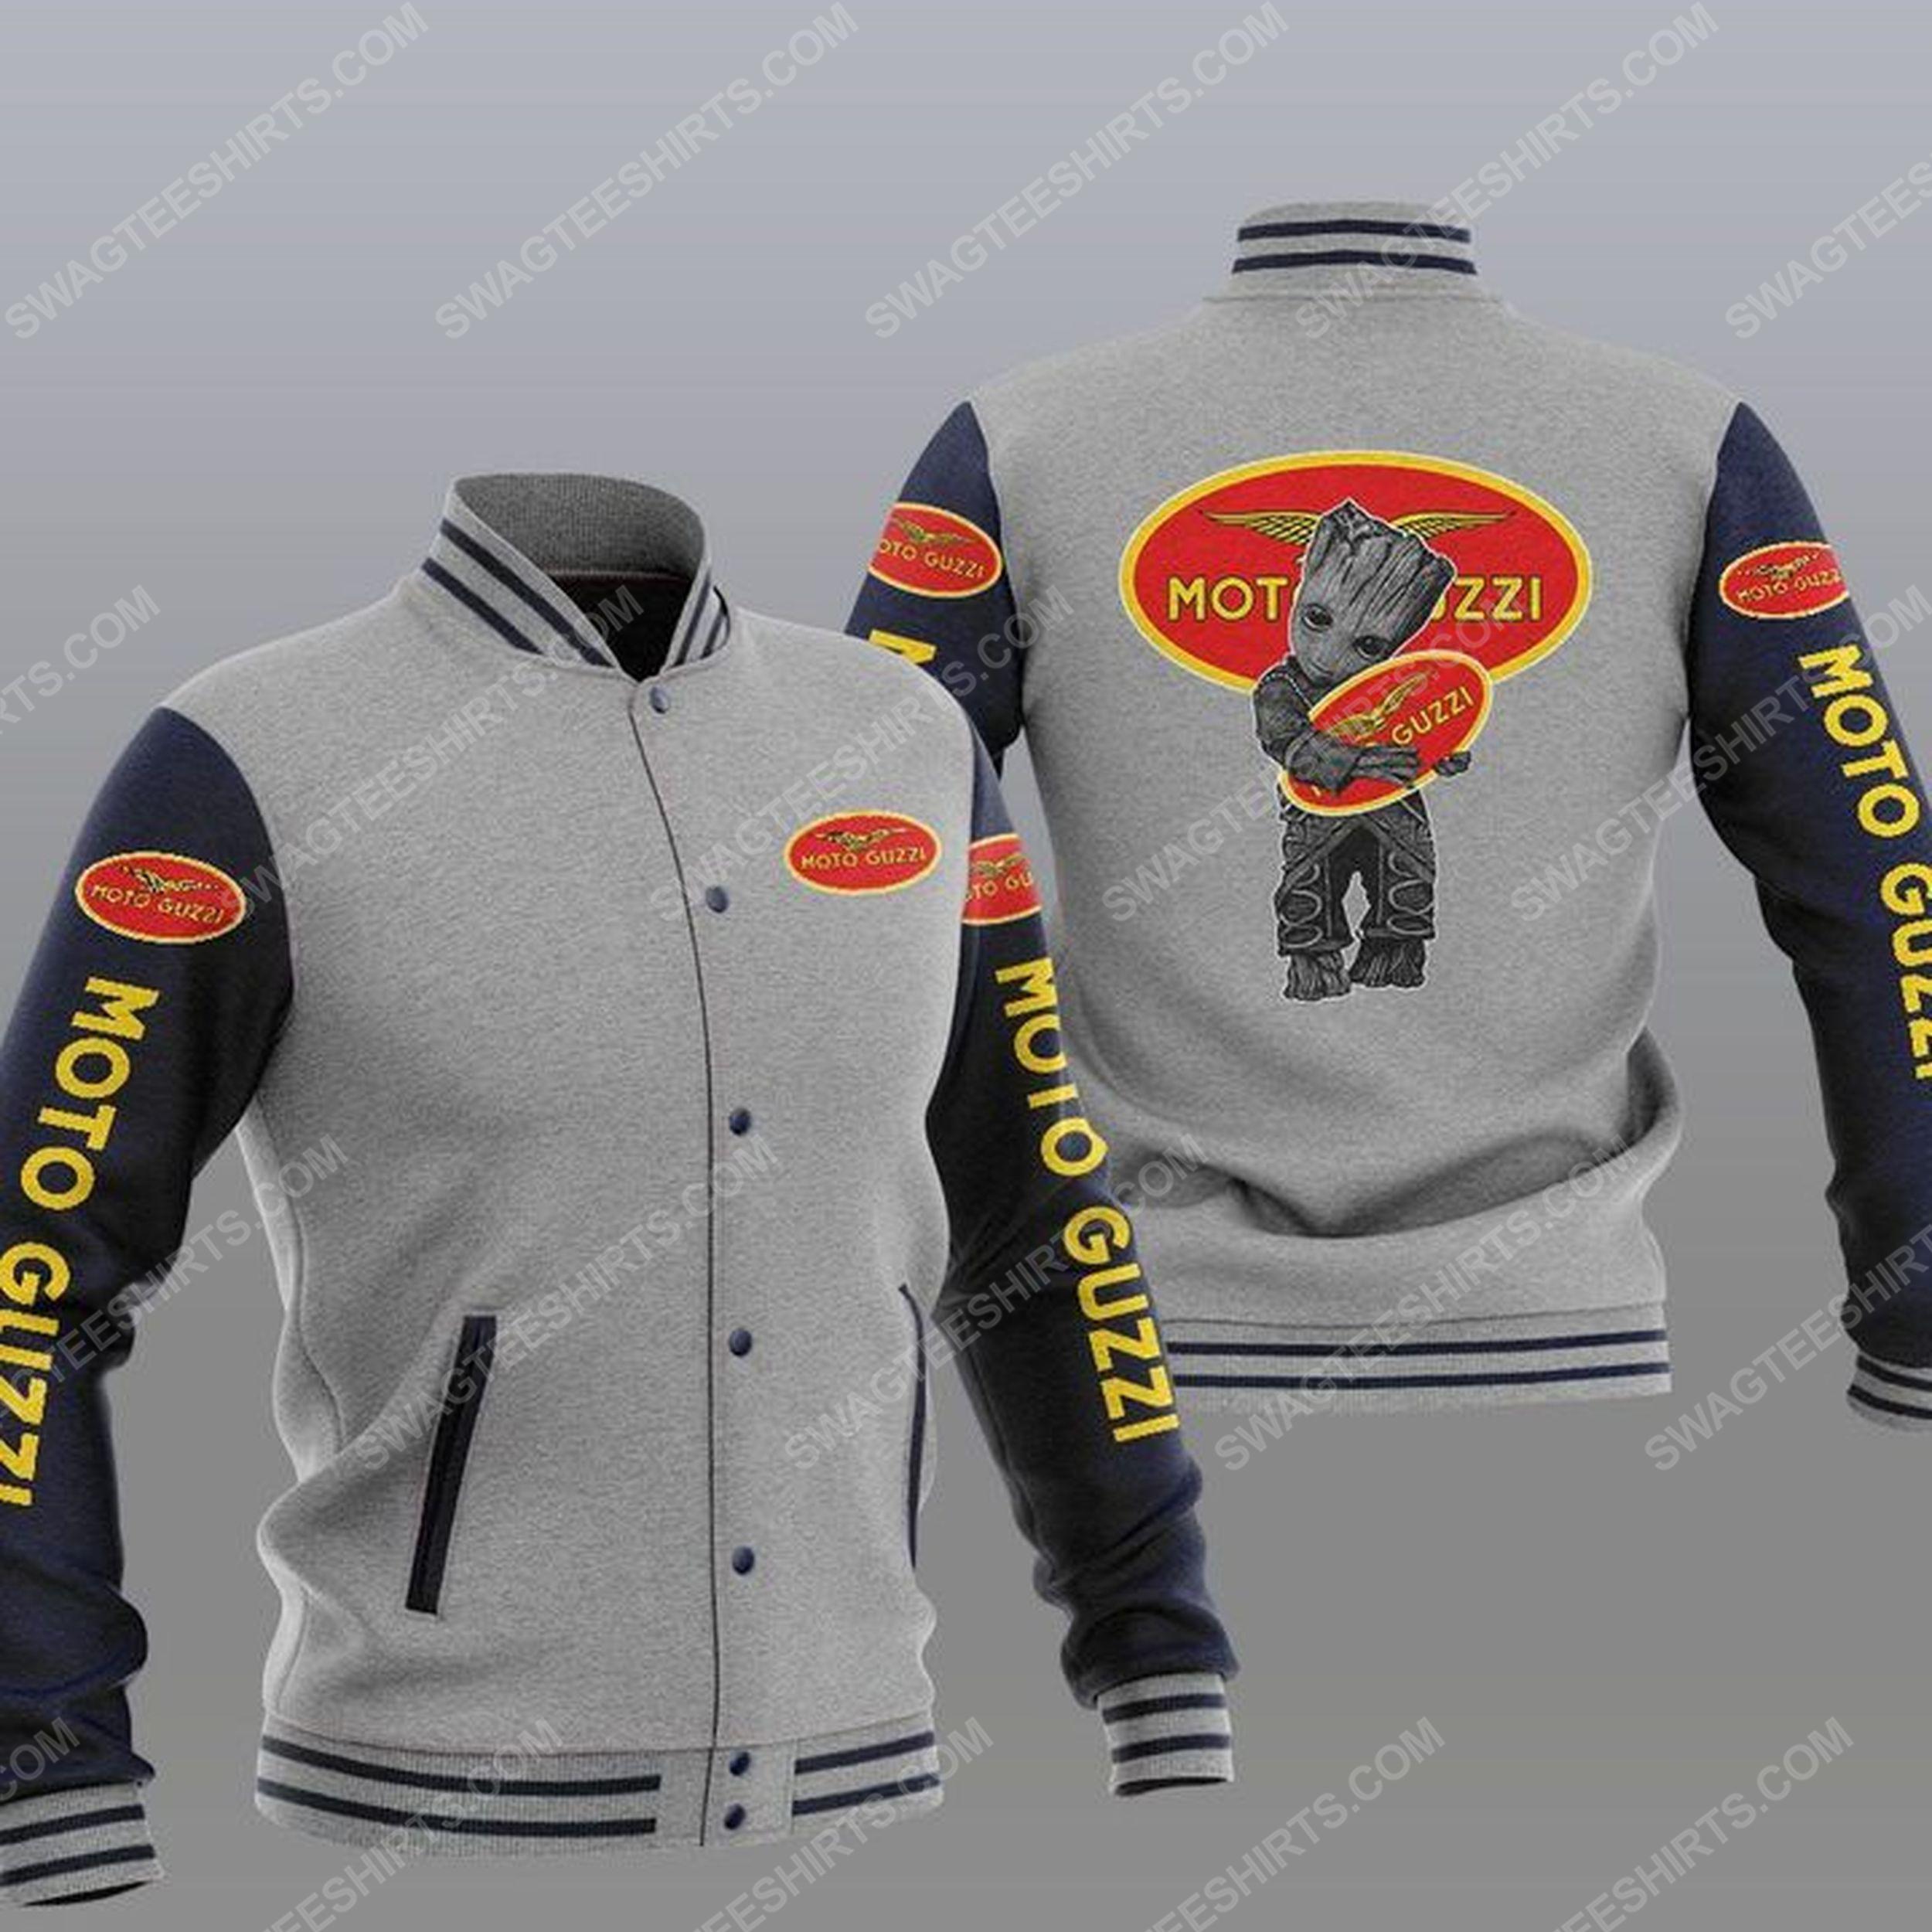 Baby groot and moto guzzi all over print baseball jacket - gray 1